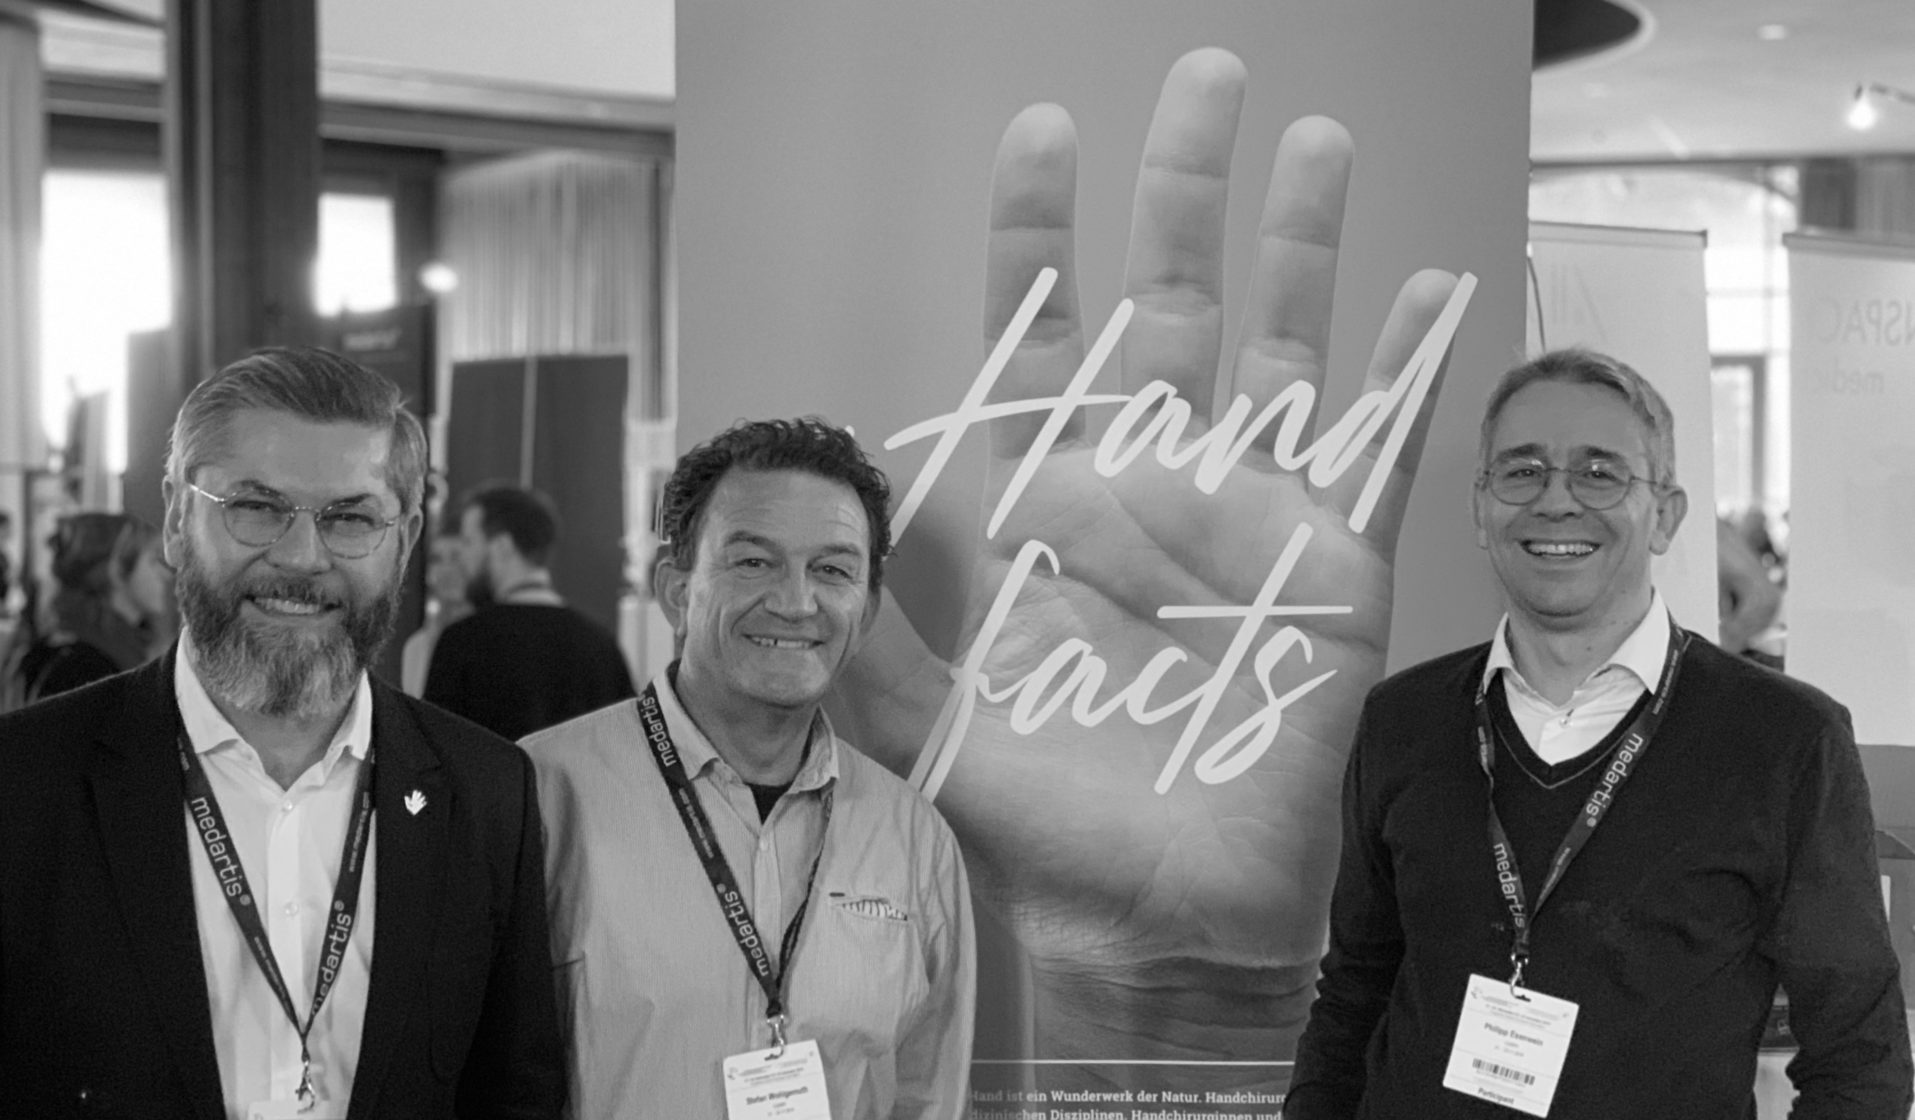 SGH 2019 | Interlaken, Handchirurgie Seefeld, Dr. Sebastian Kluge, Ultraschalldiagnostik, Karpaltunnelsyndrom, Handchirurgie, Sonographie